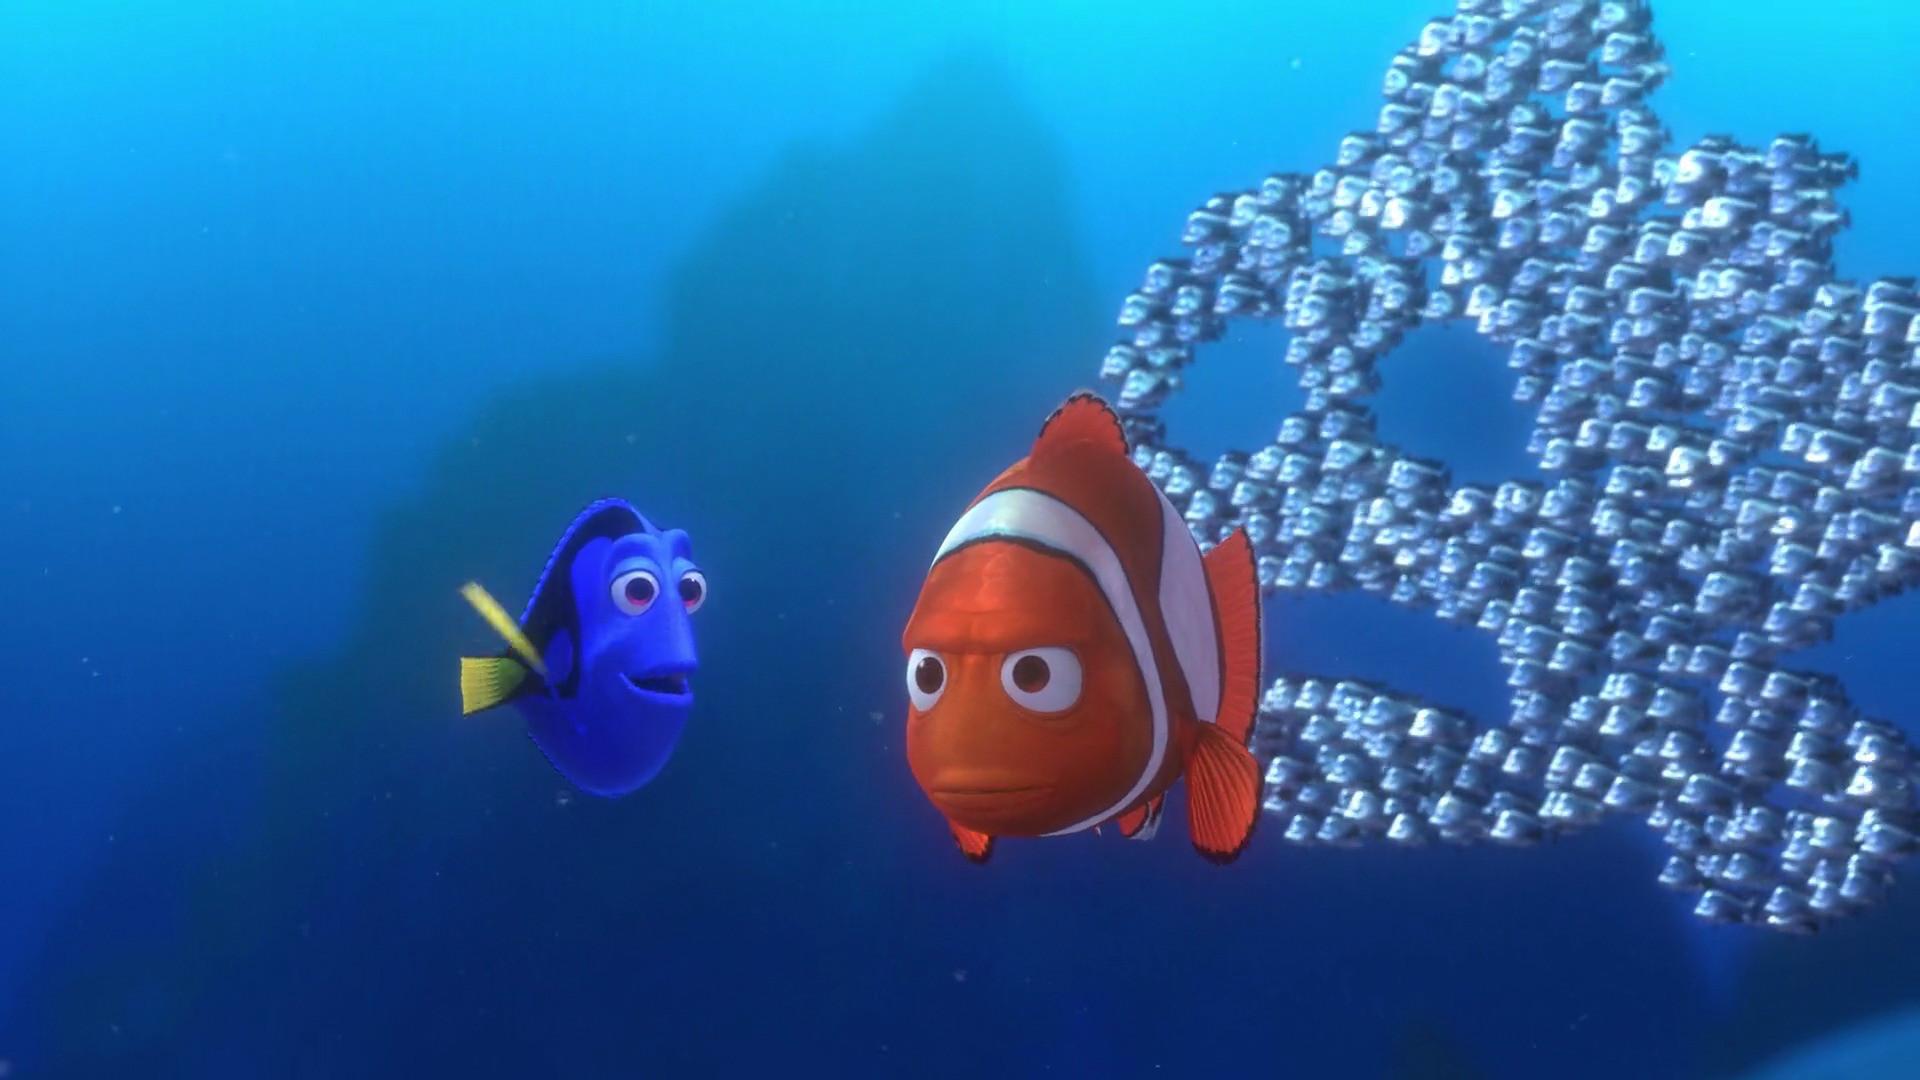 School of fish quotes quotesgram for Finding nemo fish